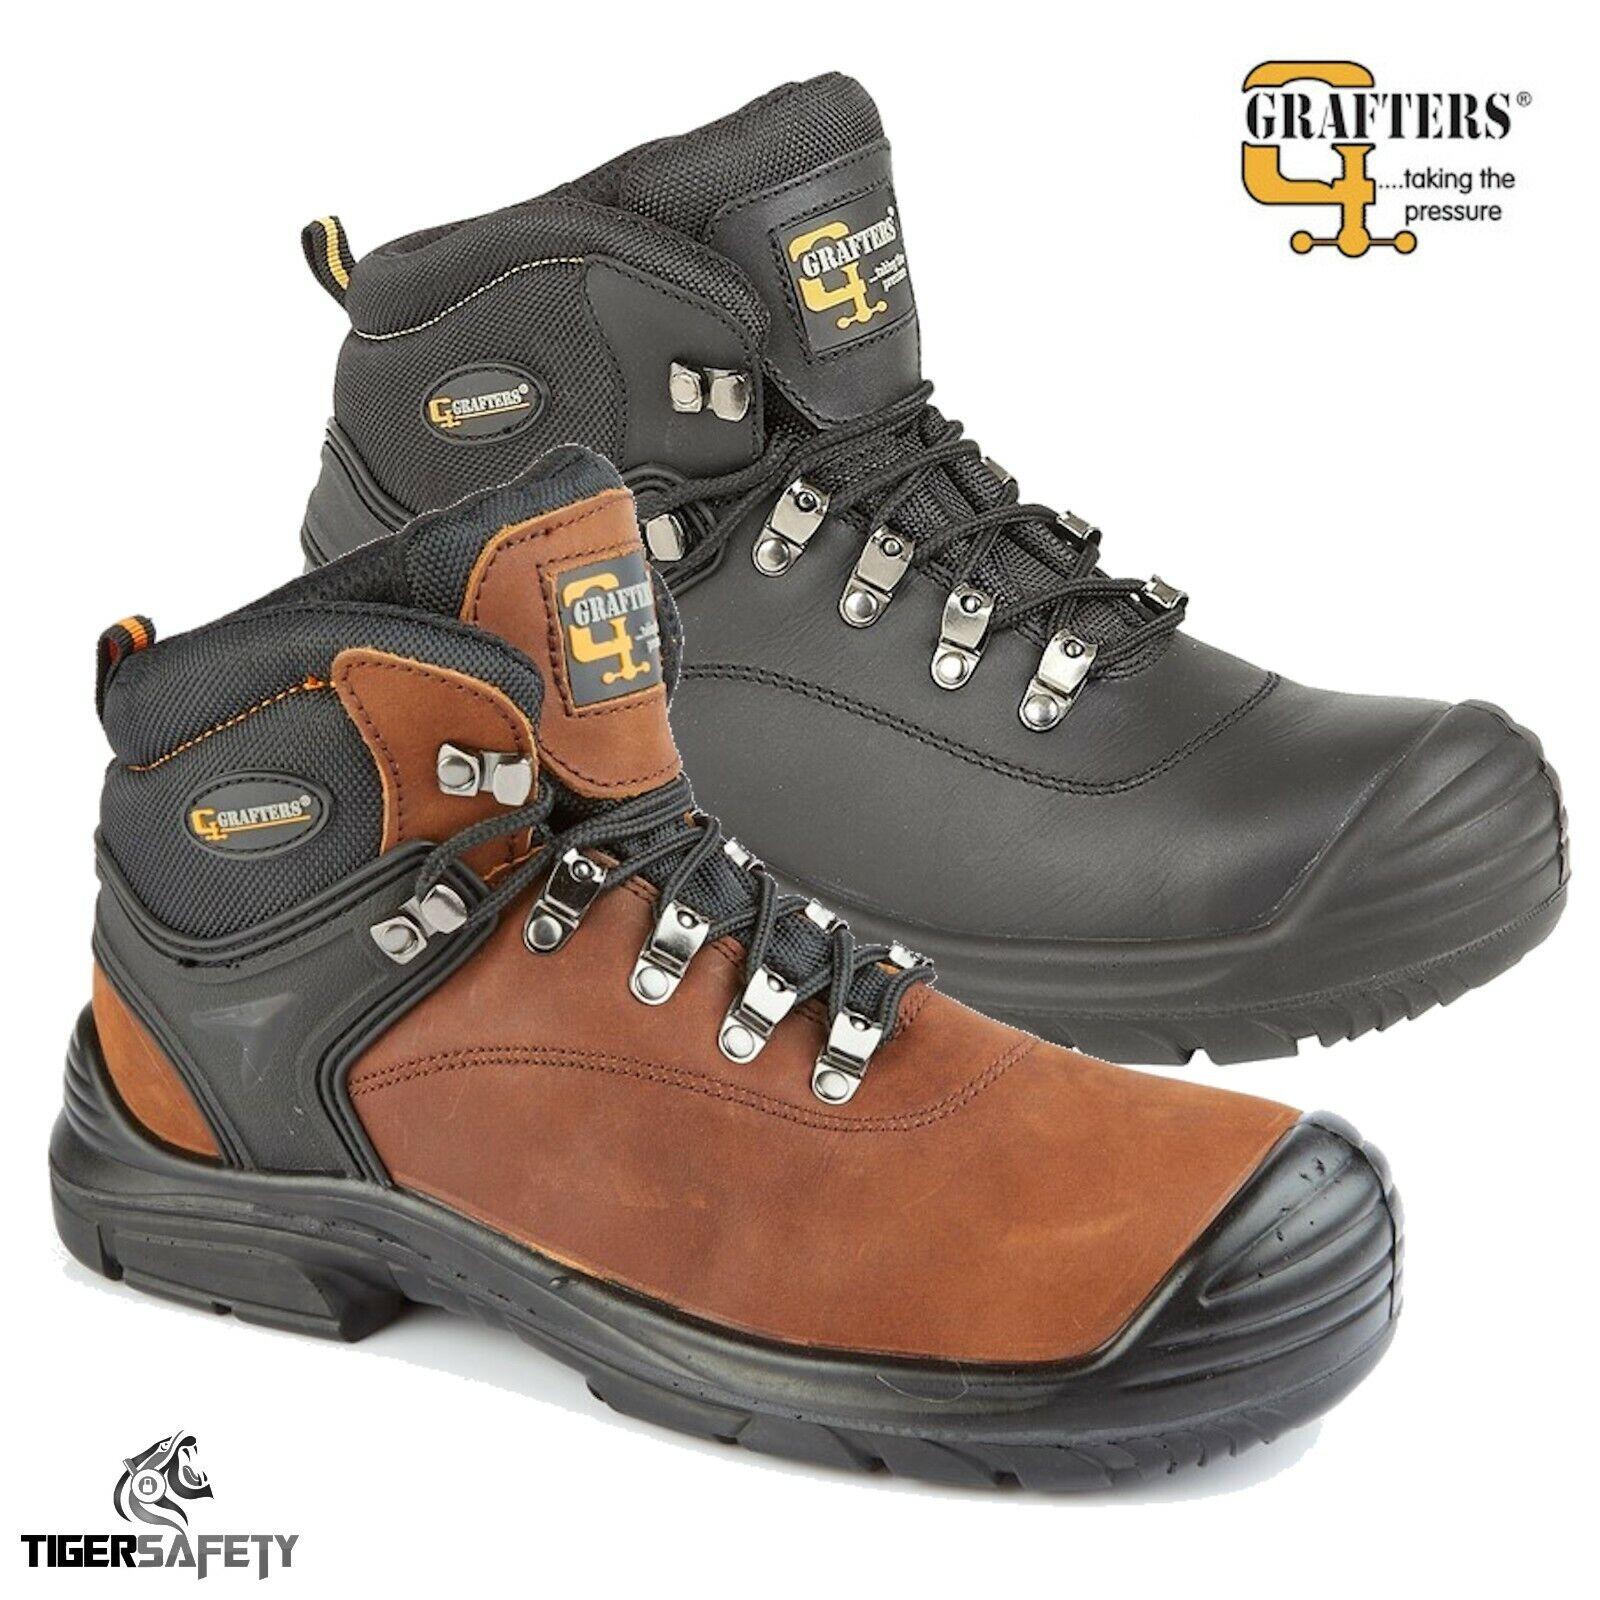 Grafters M9508 Mens S3 SRC Waterproof Wide Fitting EEEE Steel Toe Safety Boots